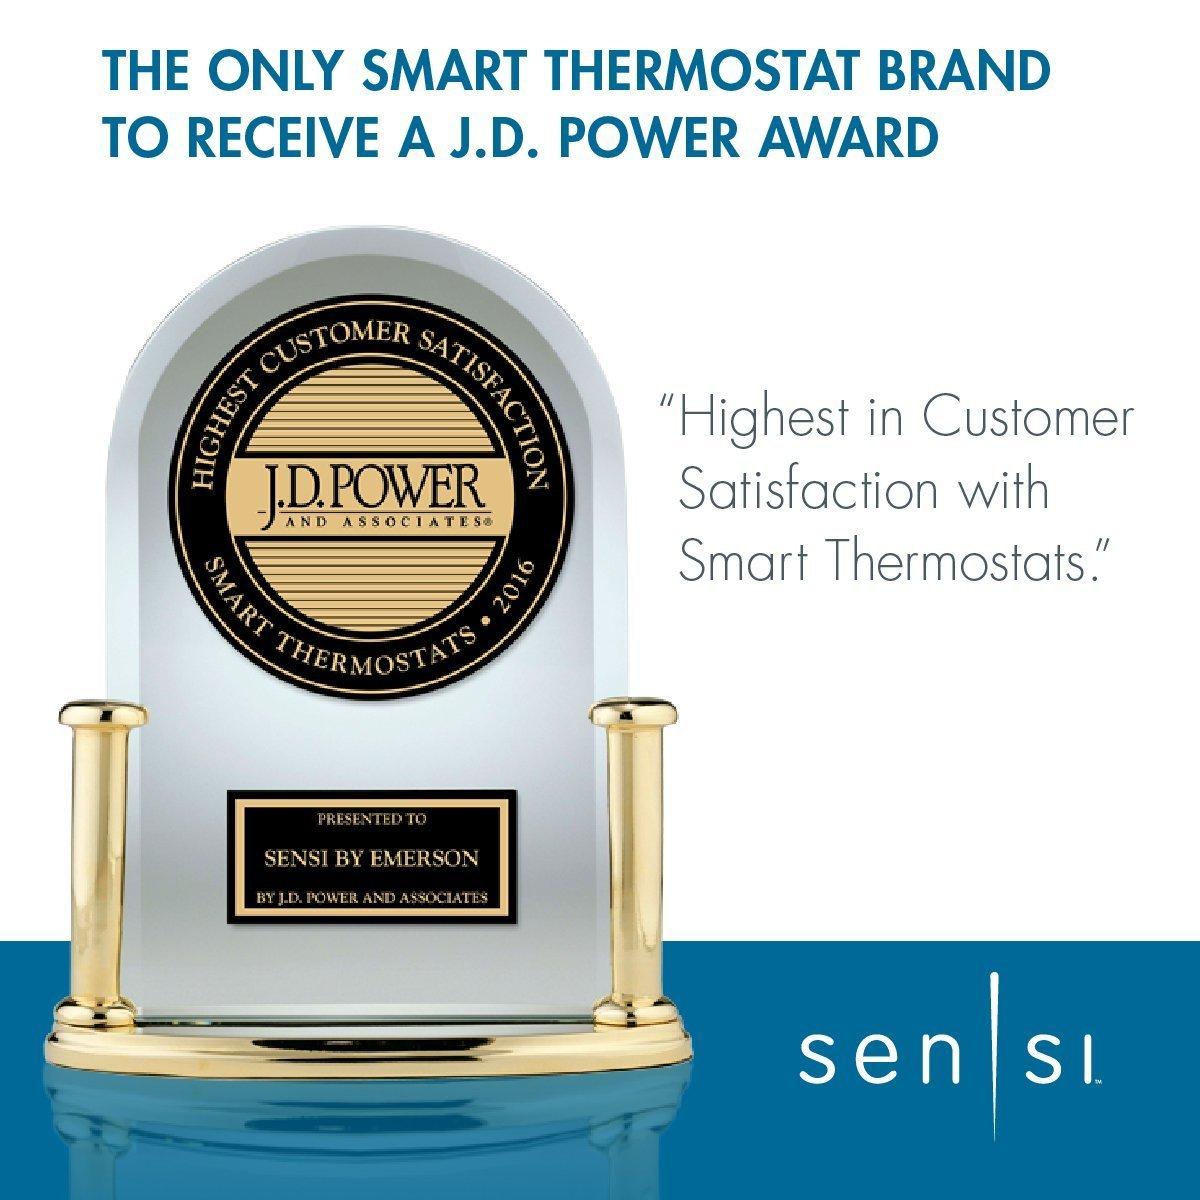 emerson sensi wi fi thermostat 1f86u 42wf for smart home amazoncom